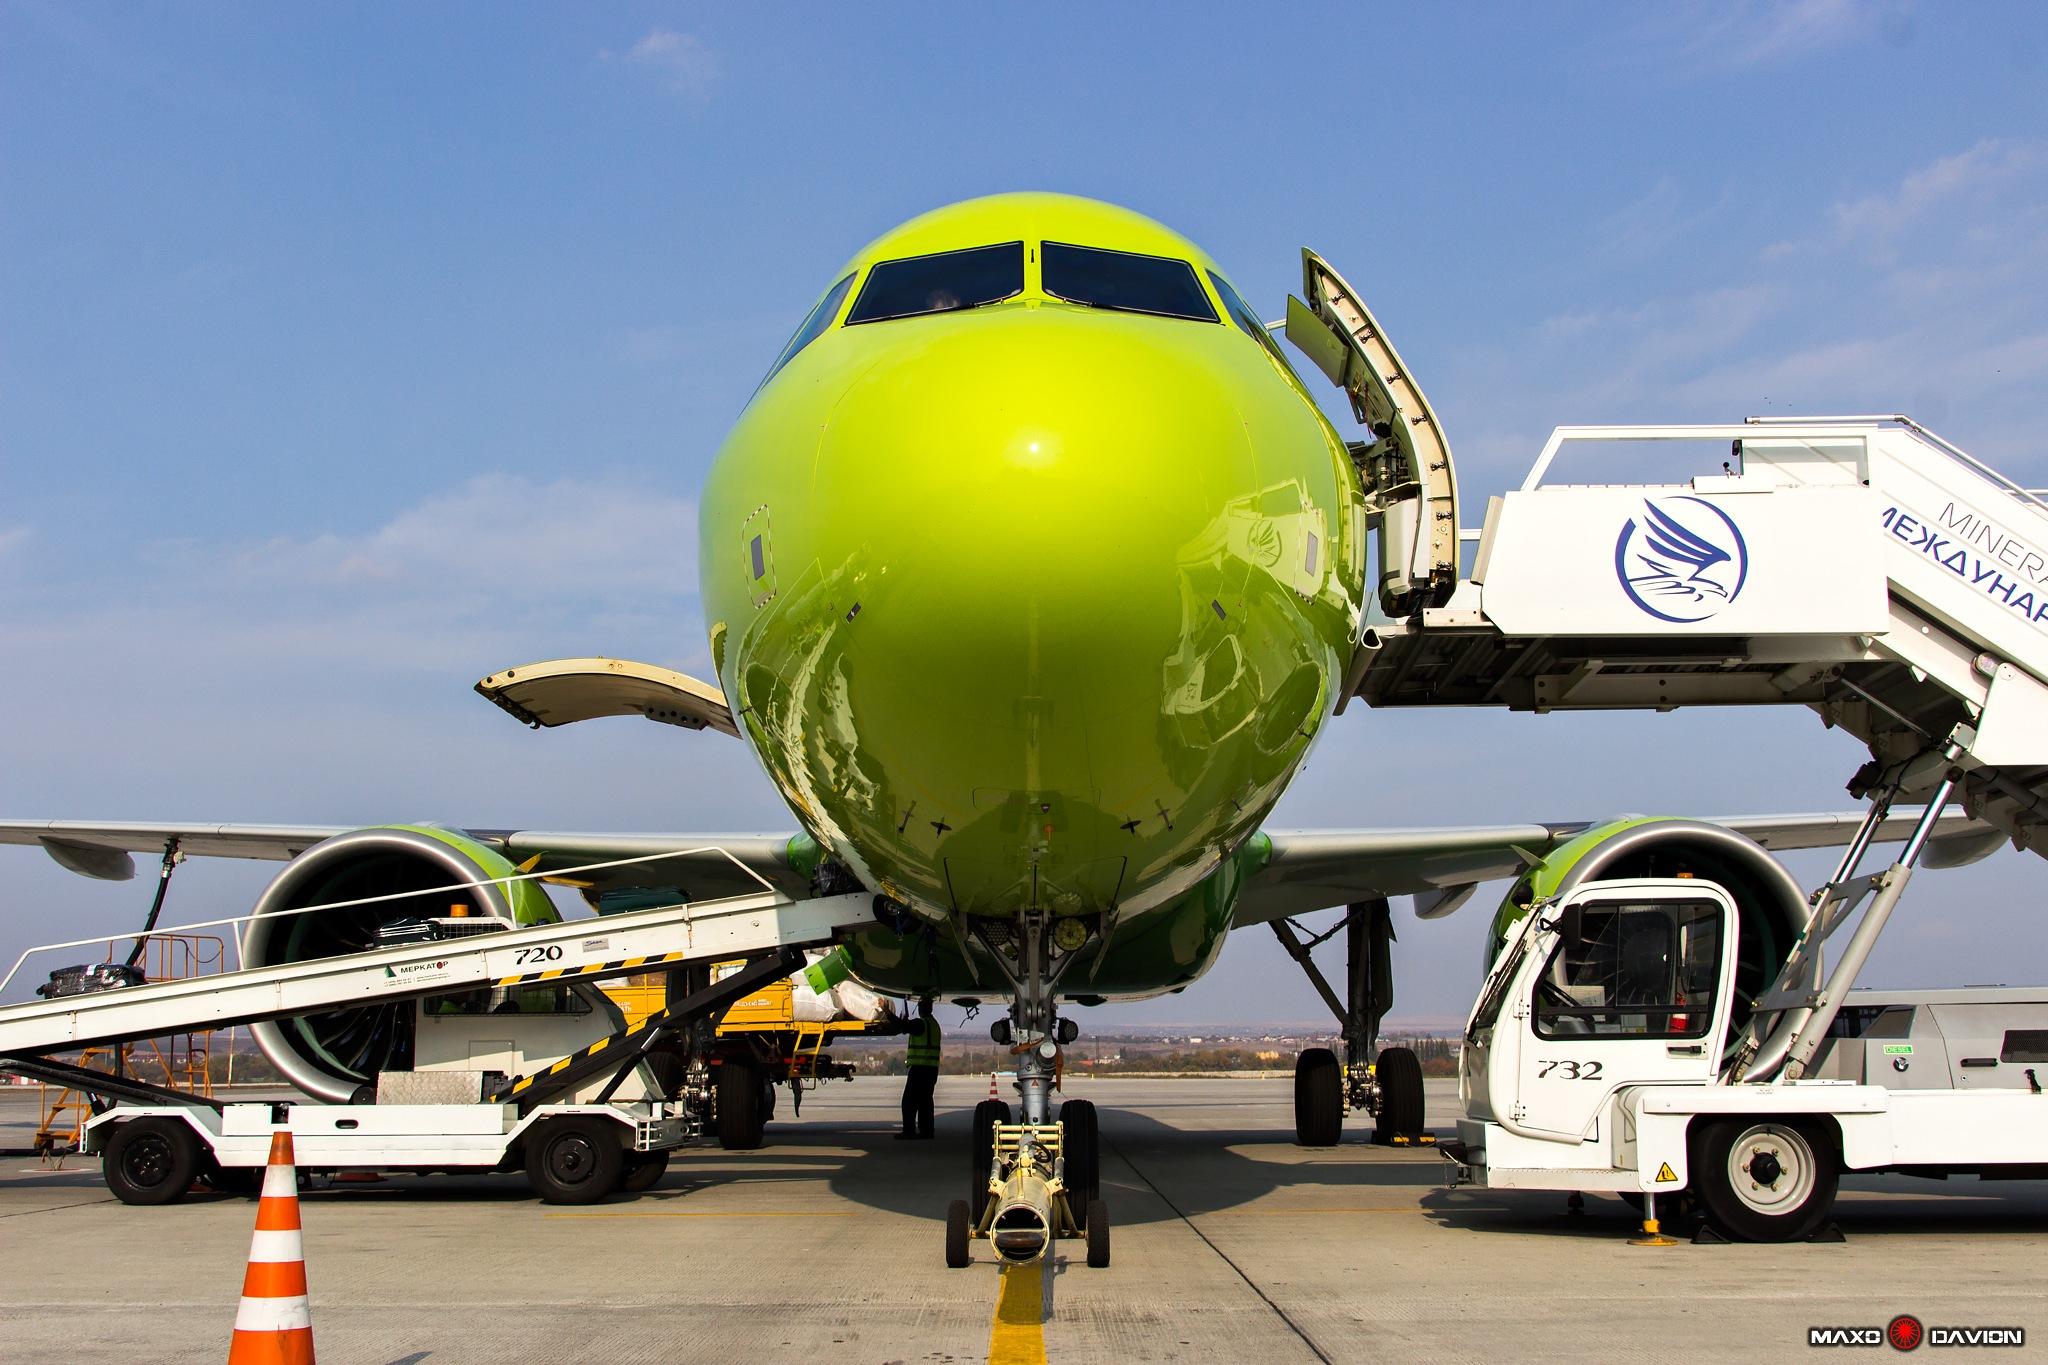 A320 Neo S7 by Maxo Davion